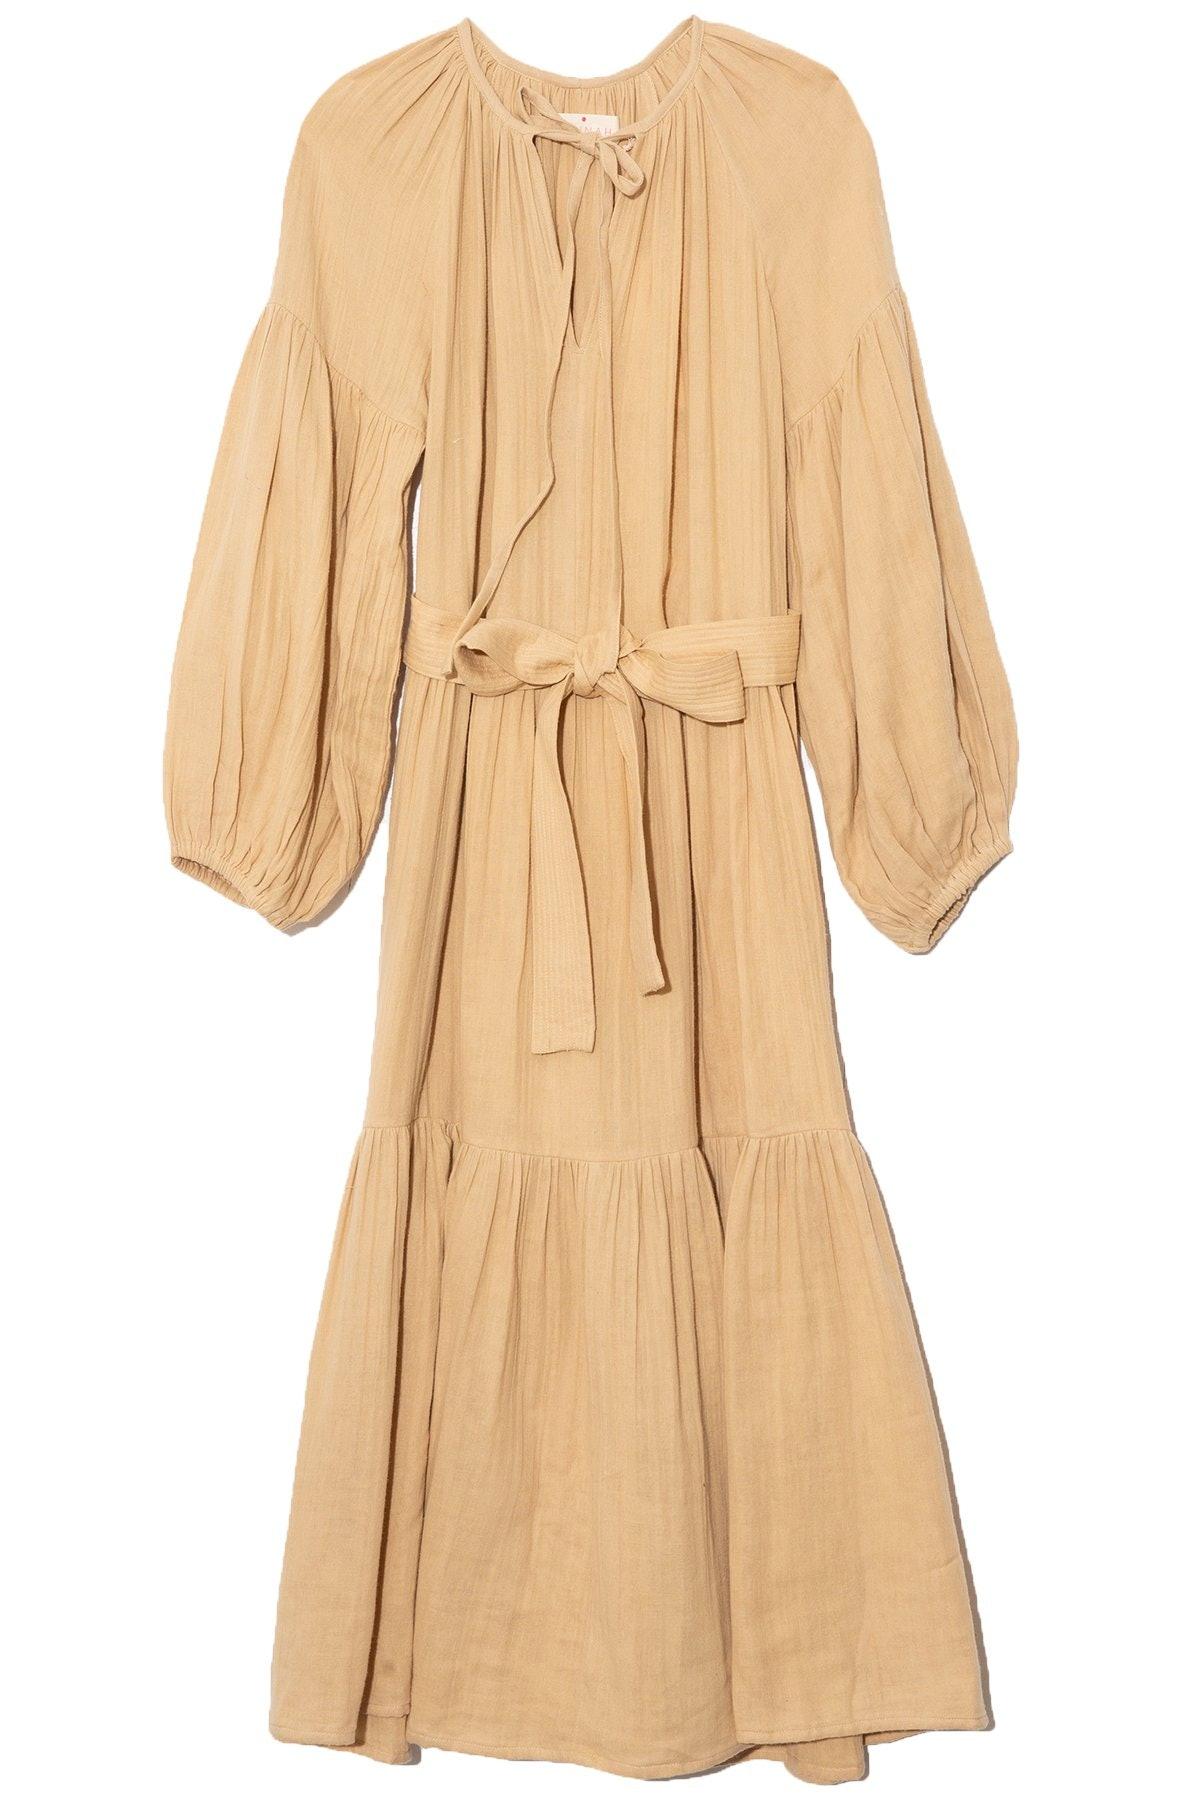 Penola Dress in Dune: image 1